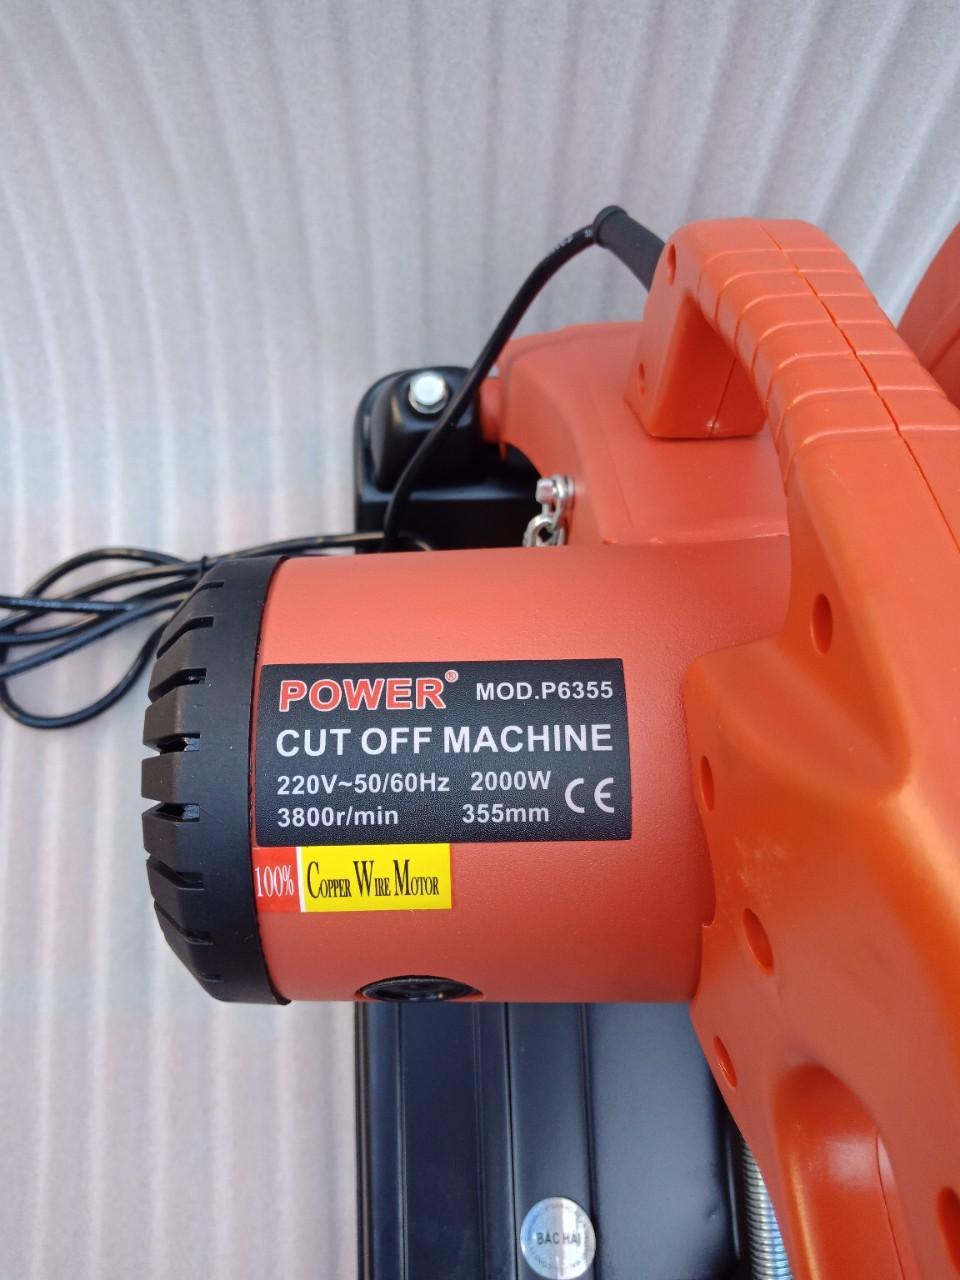 Máy cắt sắt bàn Power 2000w P6355 may cat sat ban